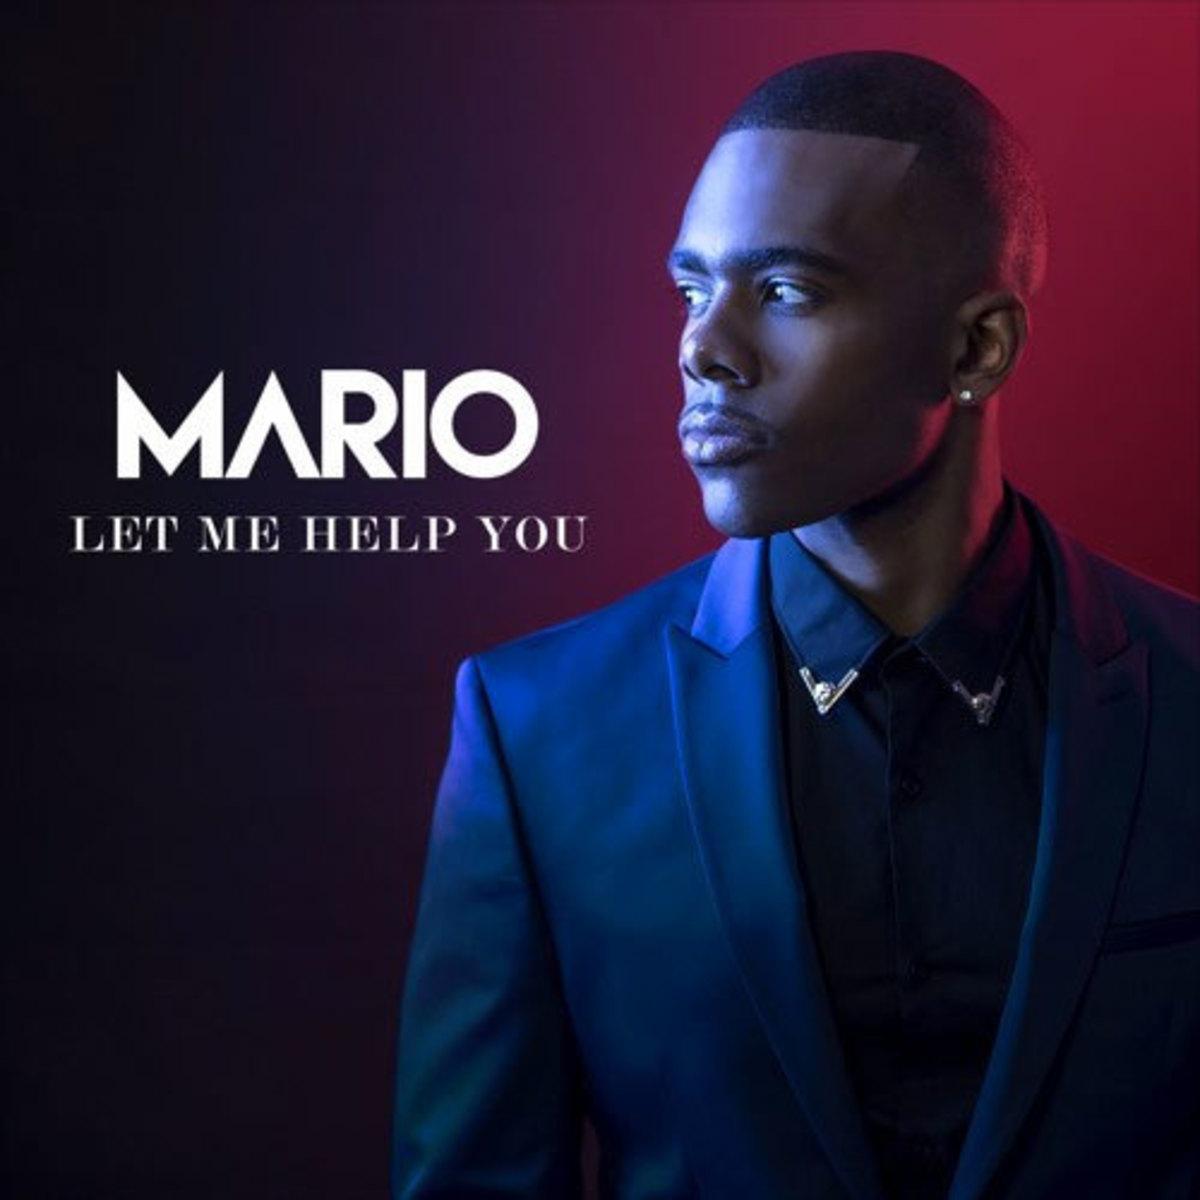 mario-let-me-help-you.jpg